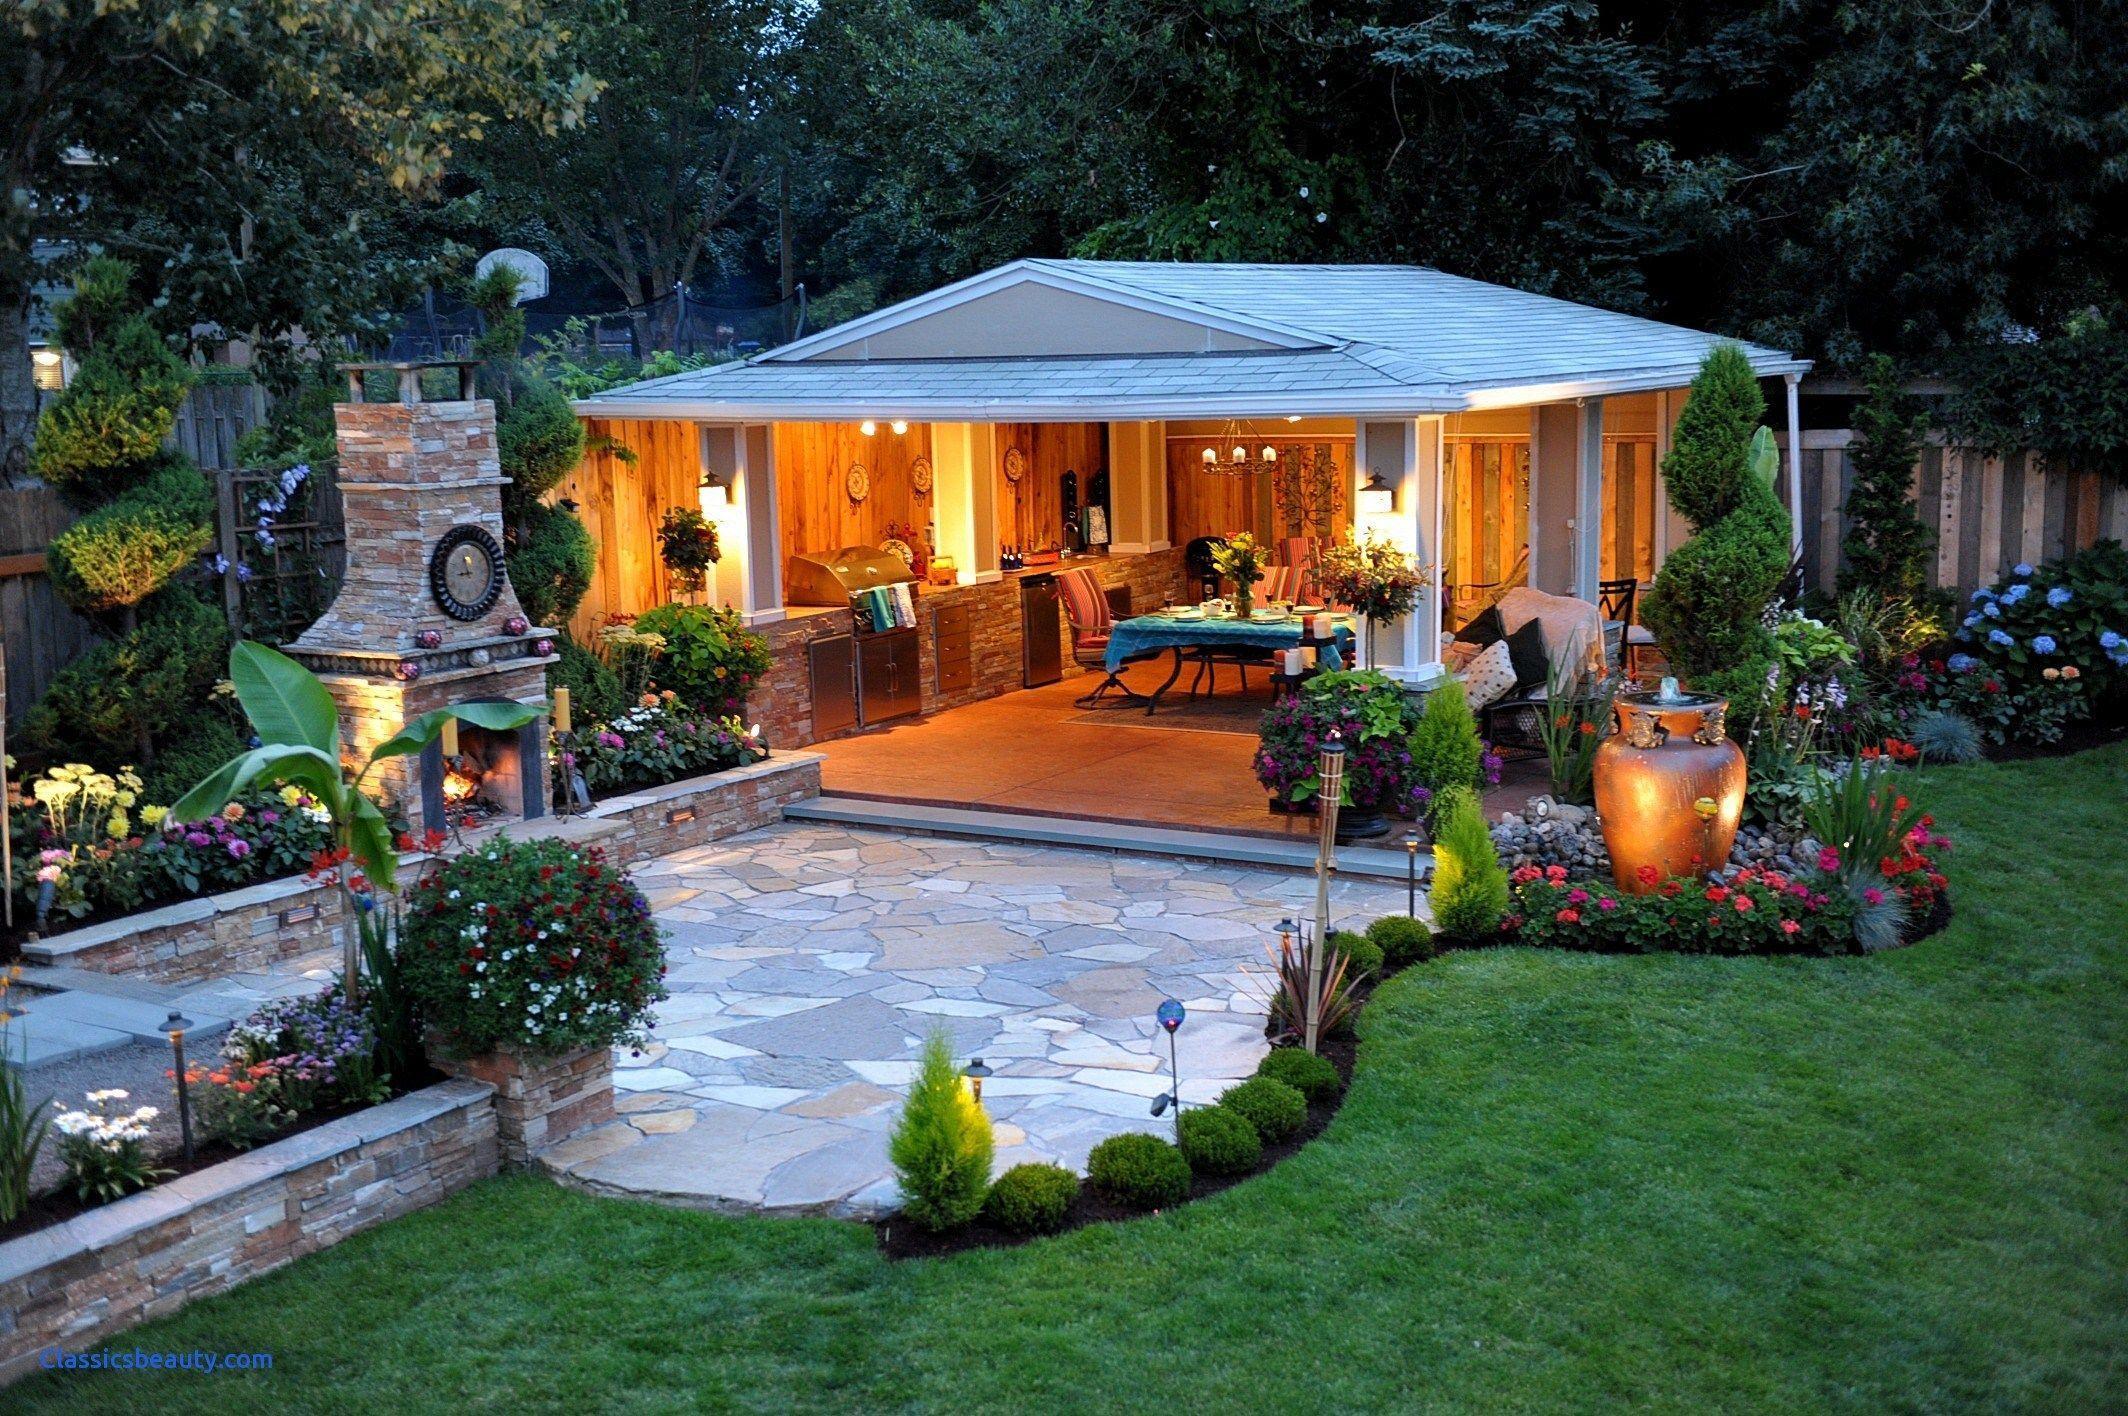 Urban Oasis Collecting Ideas For A Possible Backyard Re Do Narrow Backyard Ideas Small Backyard Landscaping Small Backyard Design